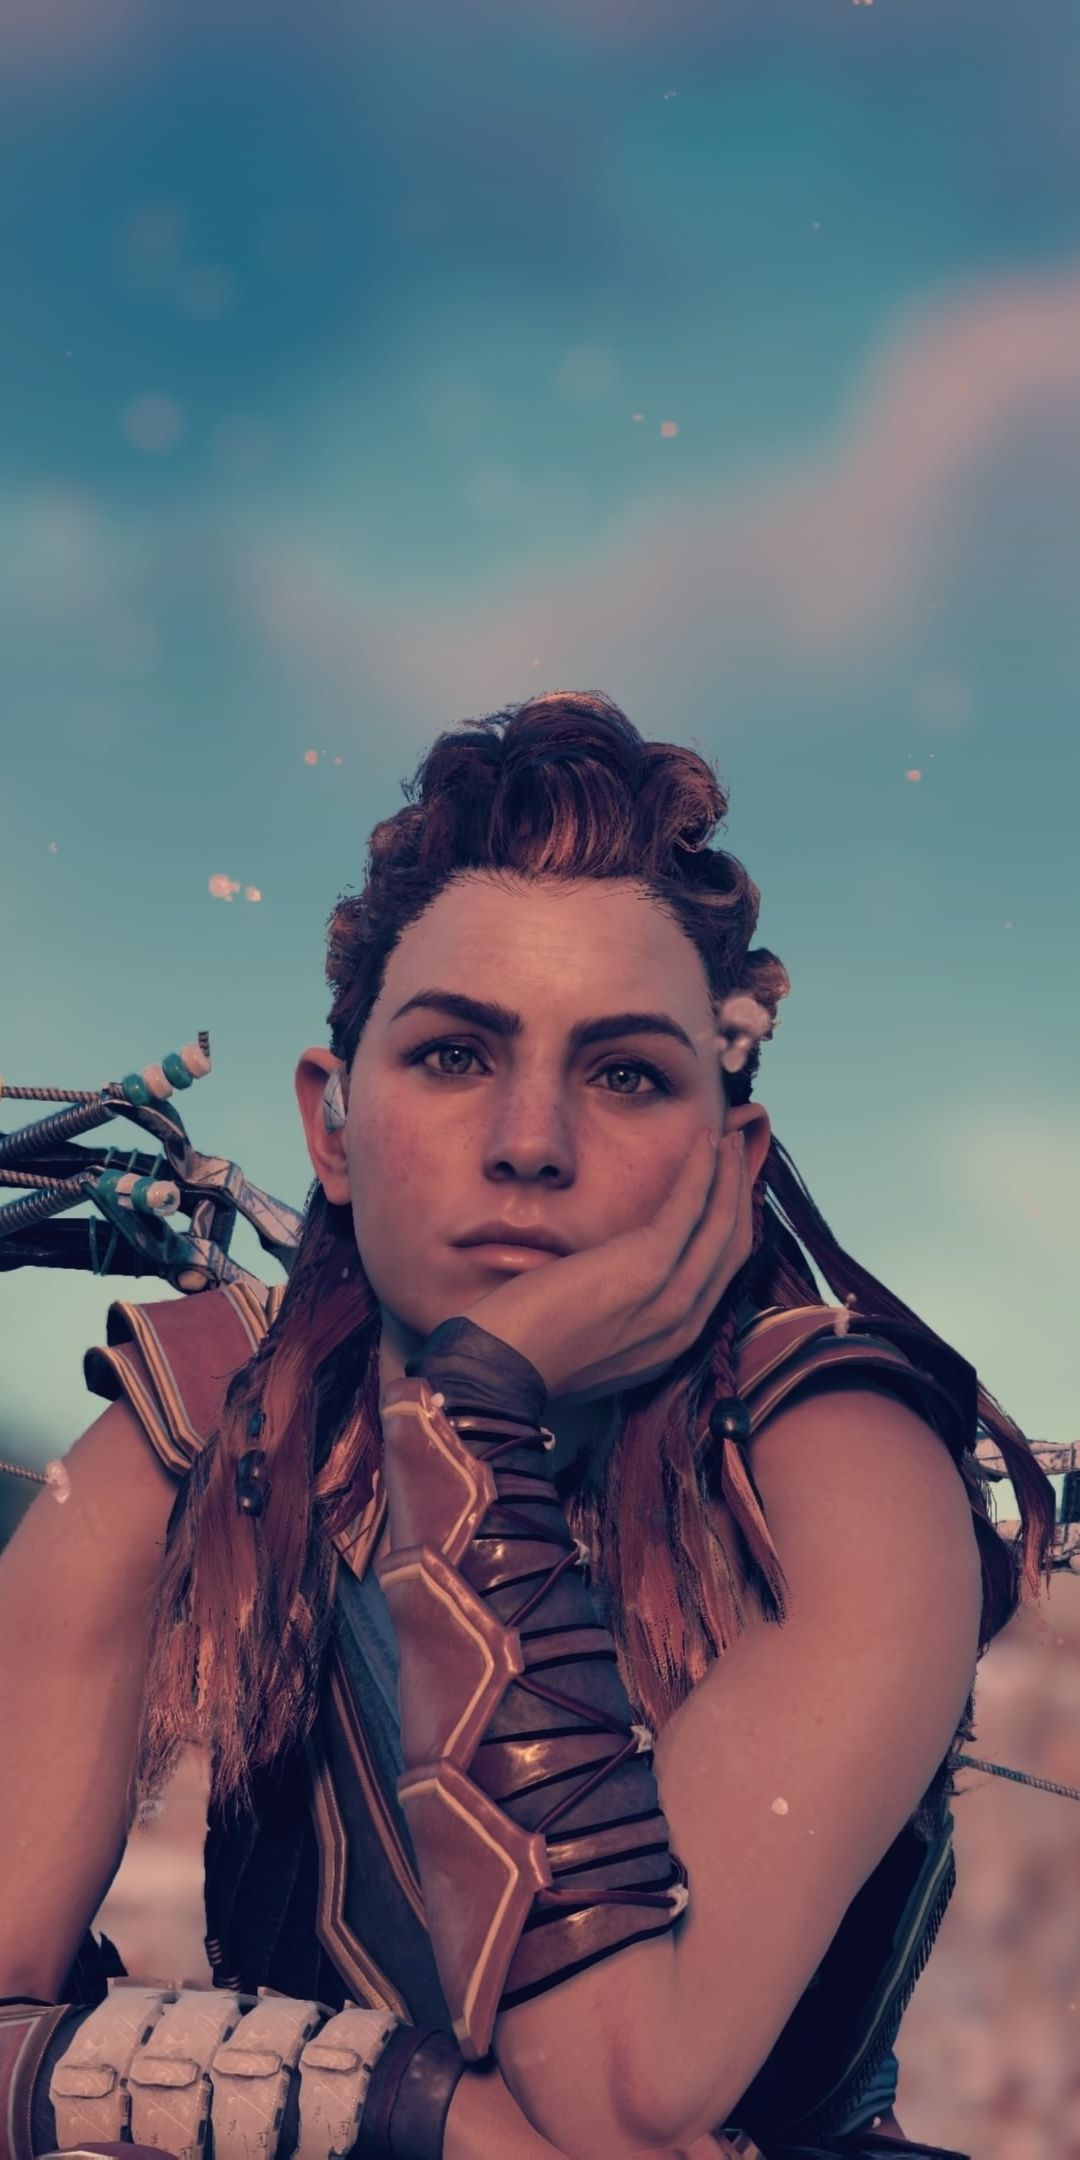 Artwork, Aloy, archer, video game, 2019, Horizon Zero Dawn, 1080x2160 wallpaper